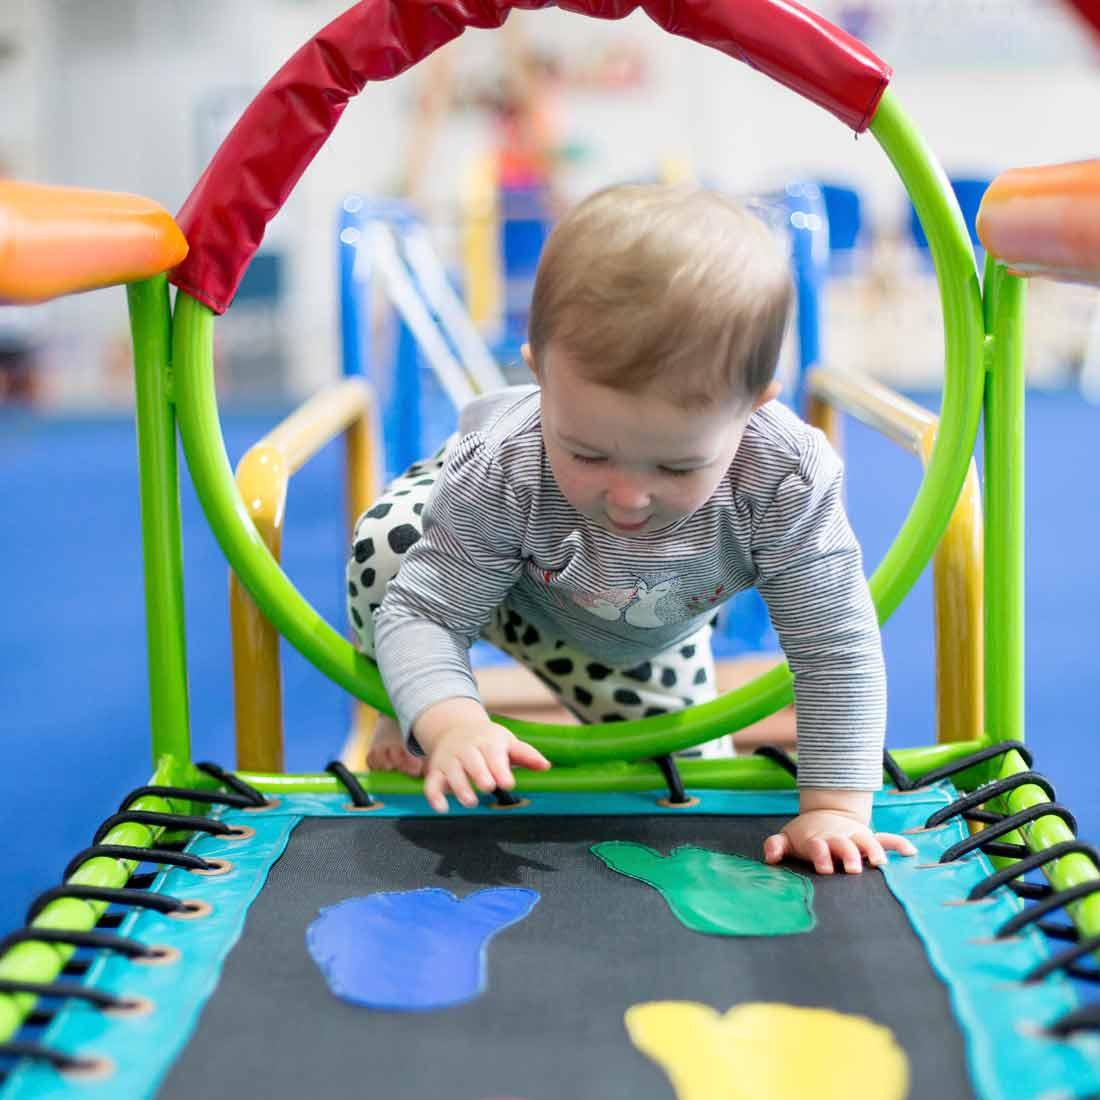 Seacliff KinderGym BabyGym